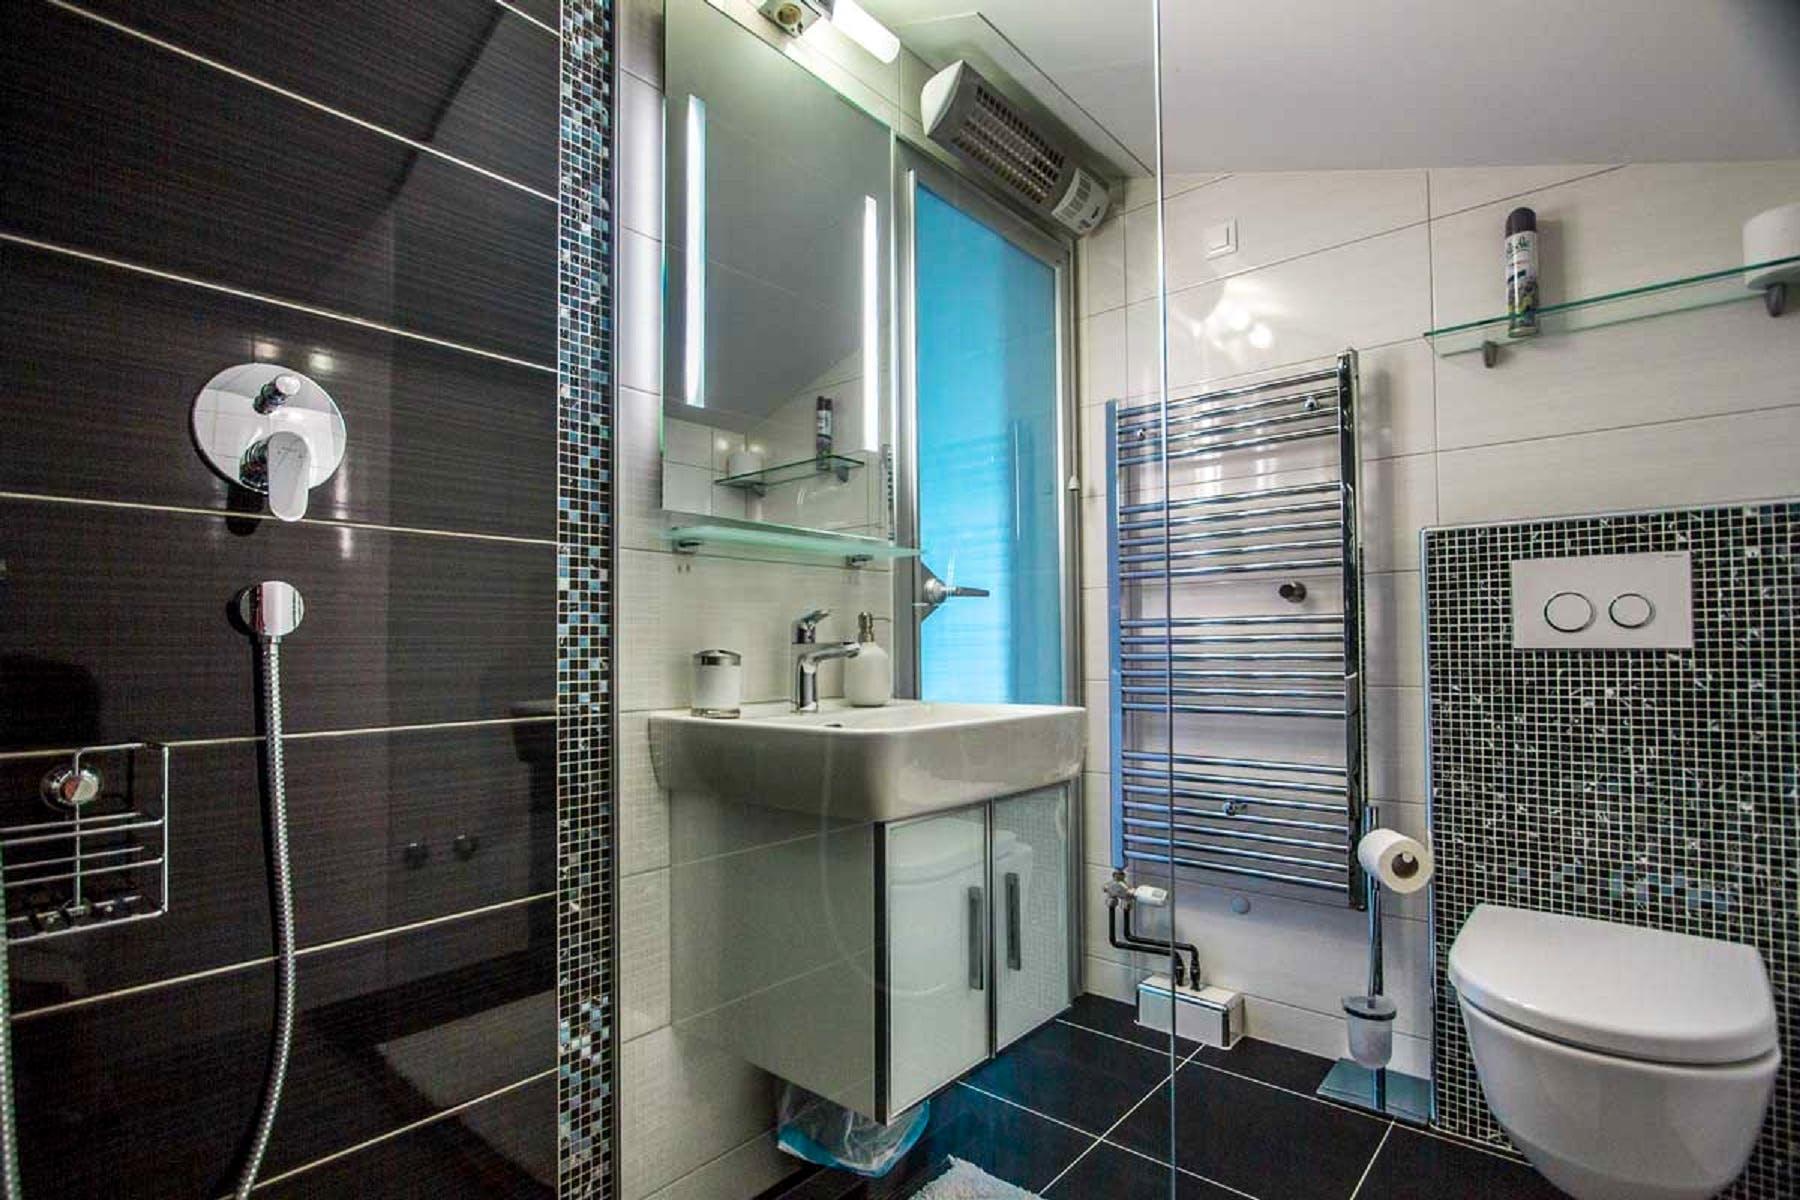 Contemporarly furnished bathroom